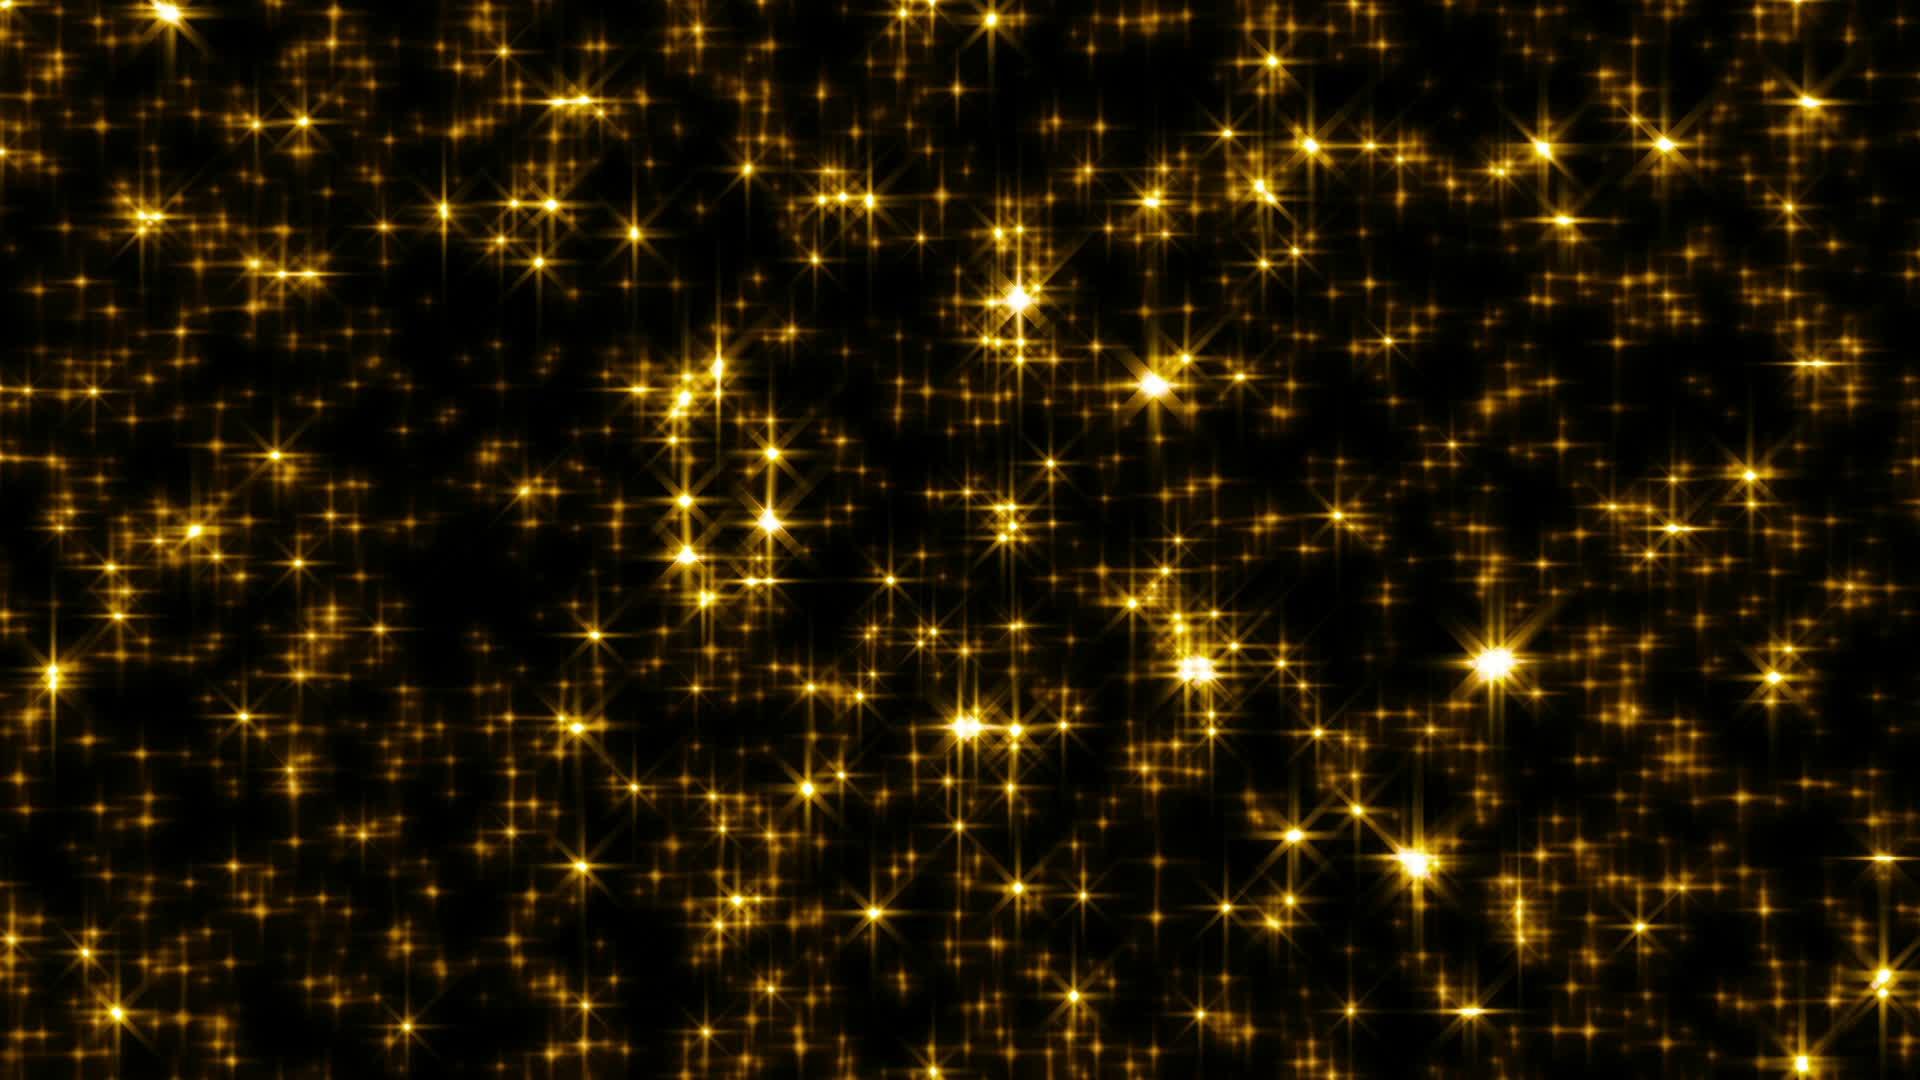 Gold black pattern